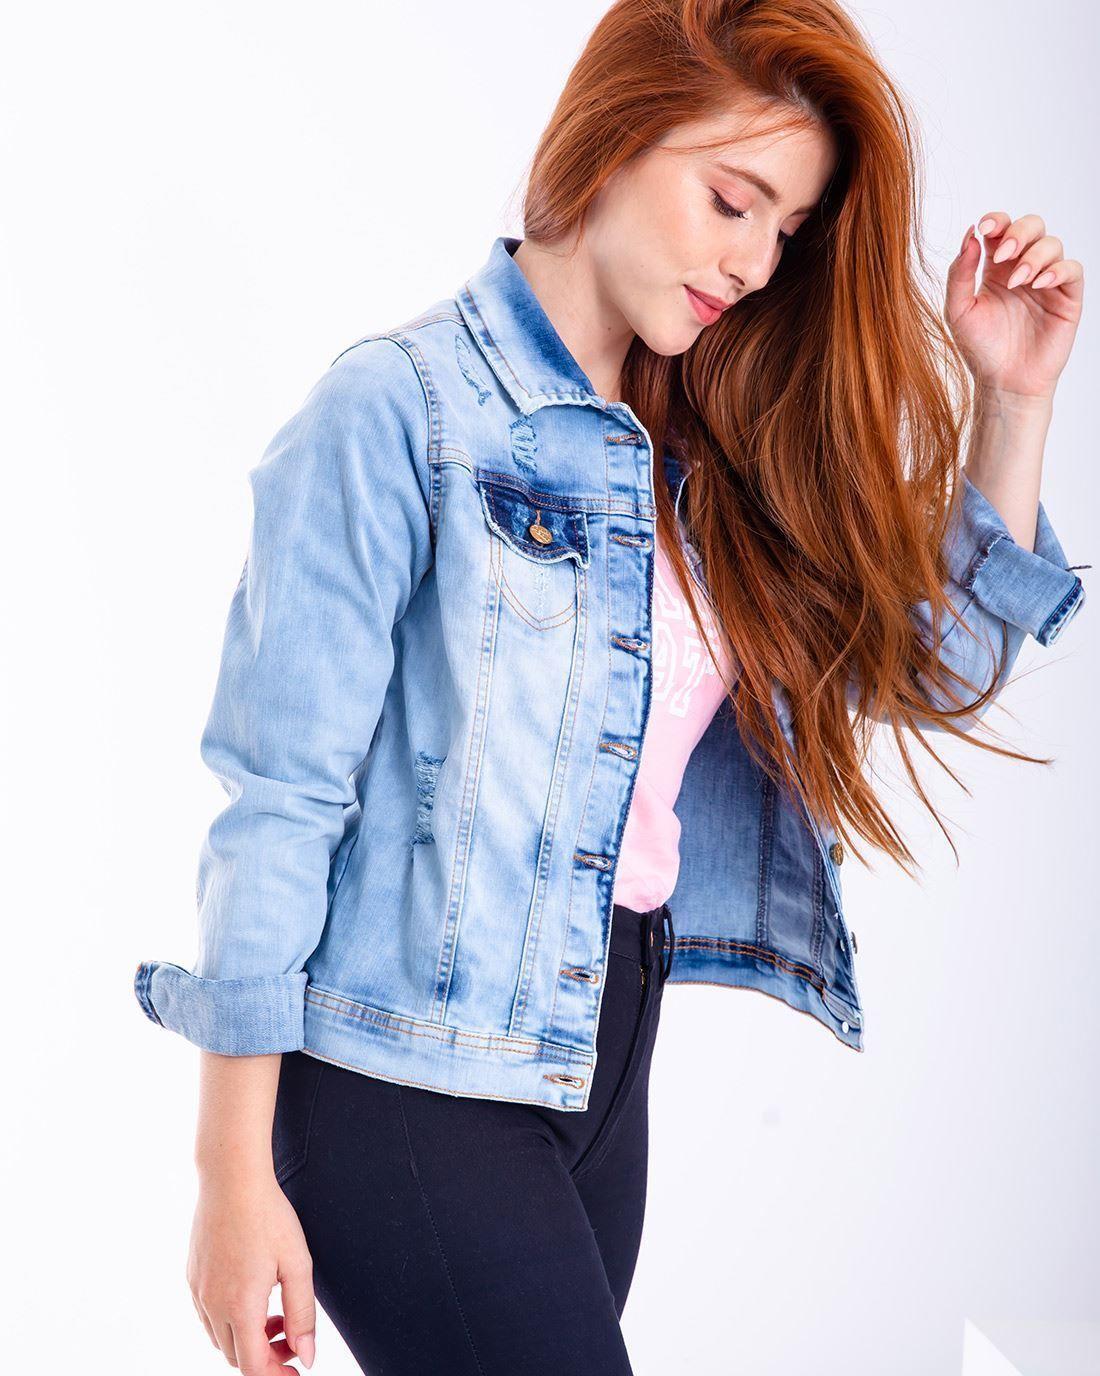 0c3576ef6 Jaqueta Jeans Badcat Clara - Compre agora | Badcat Store